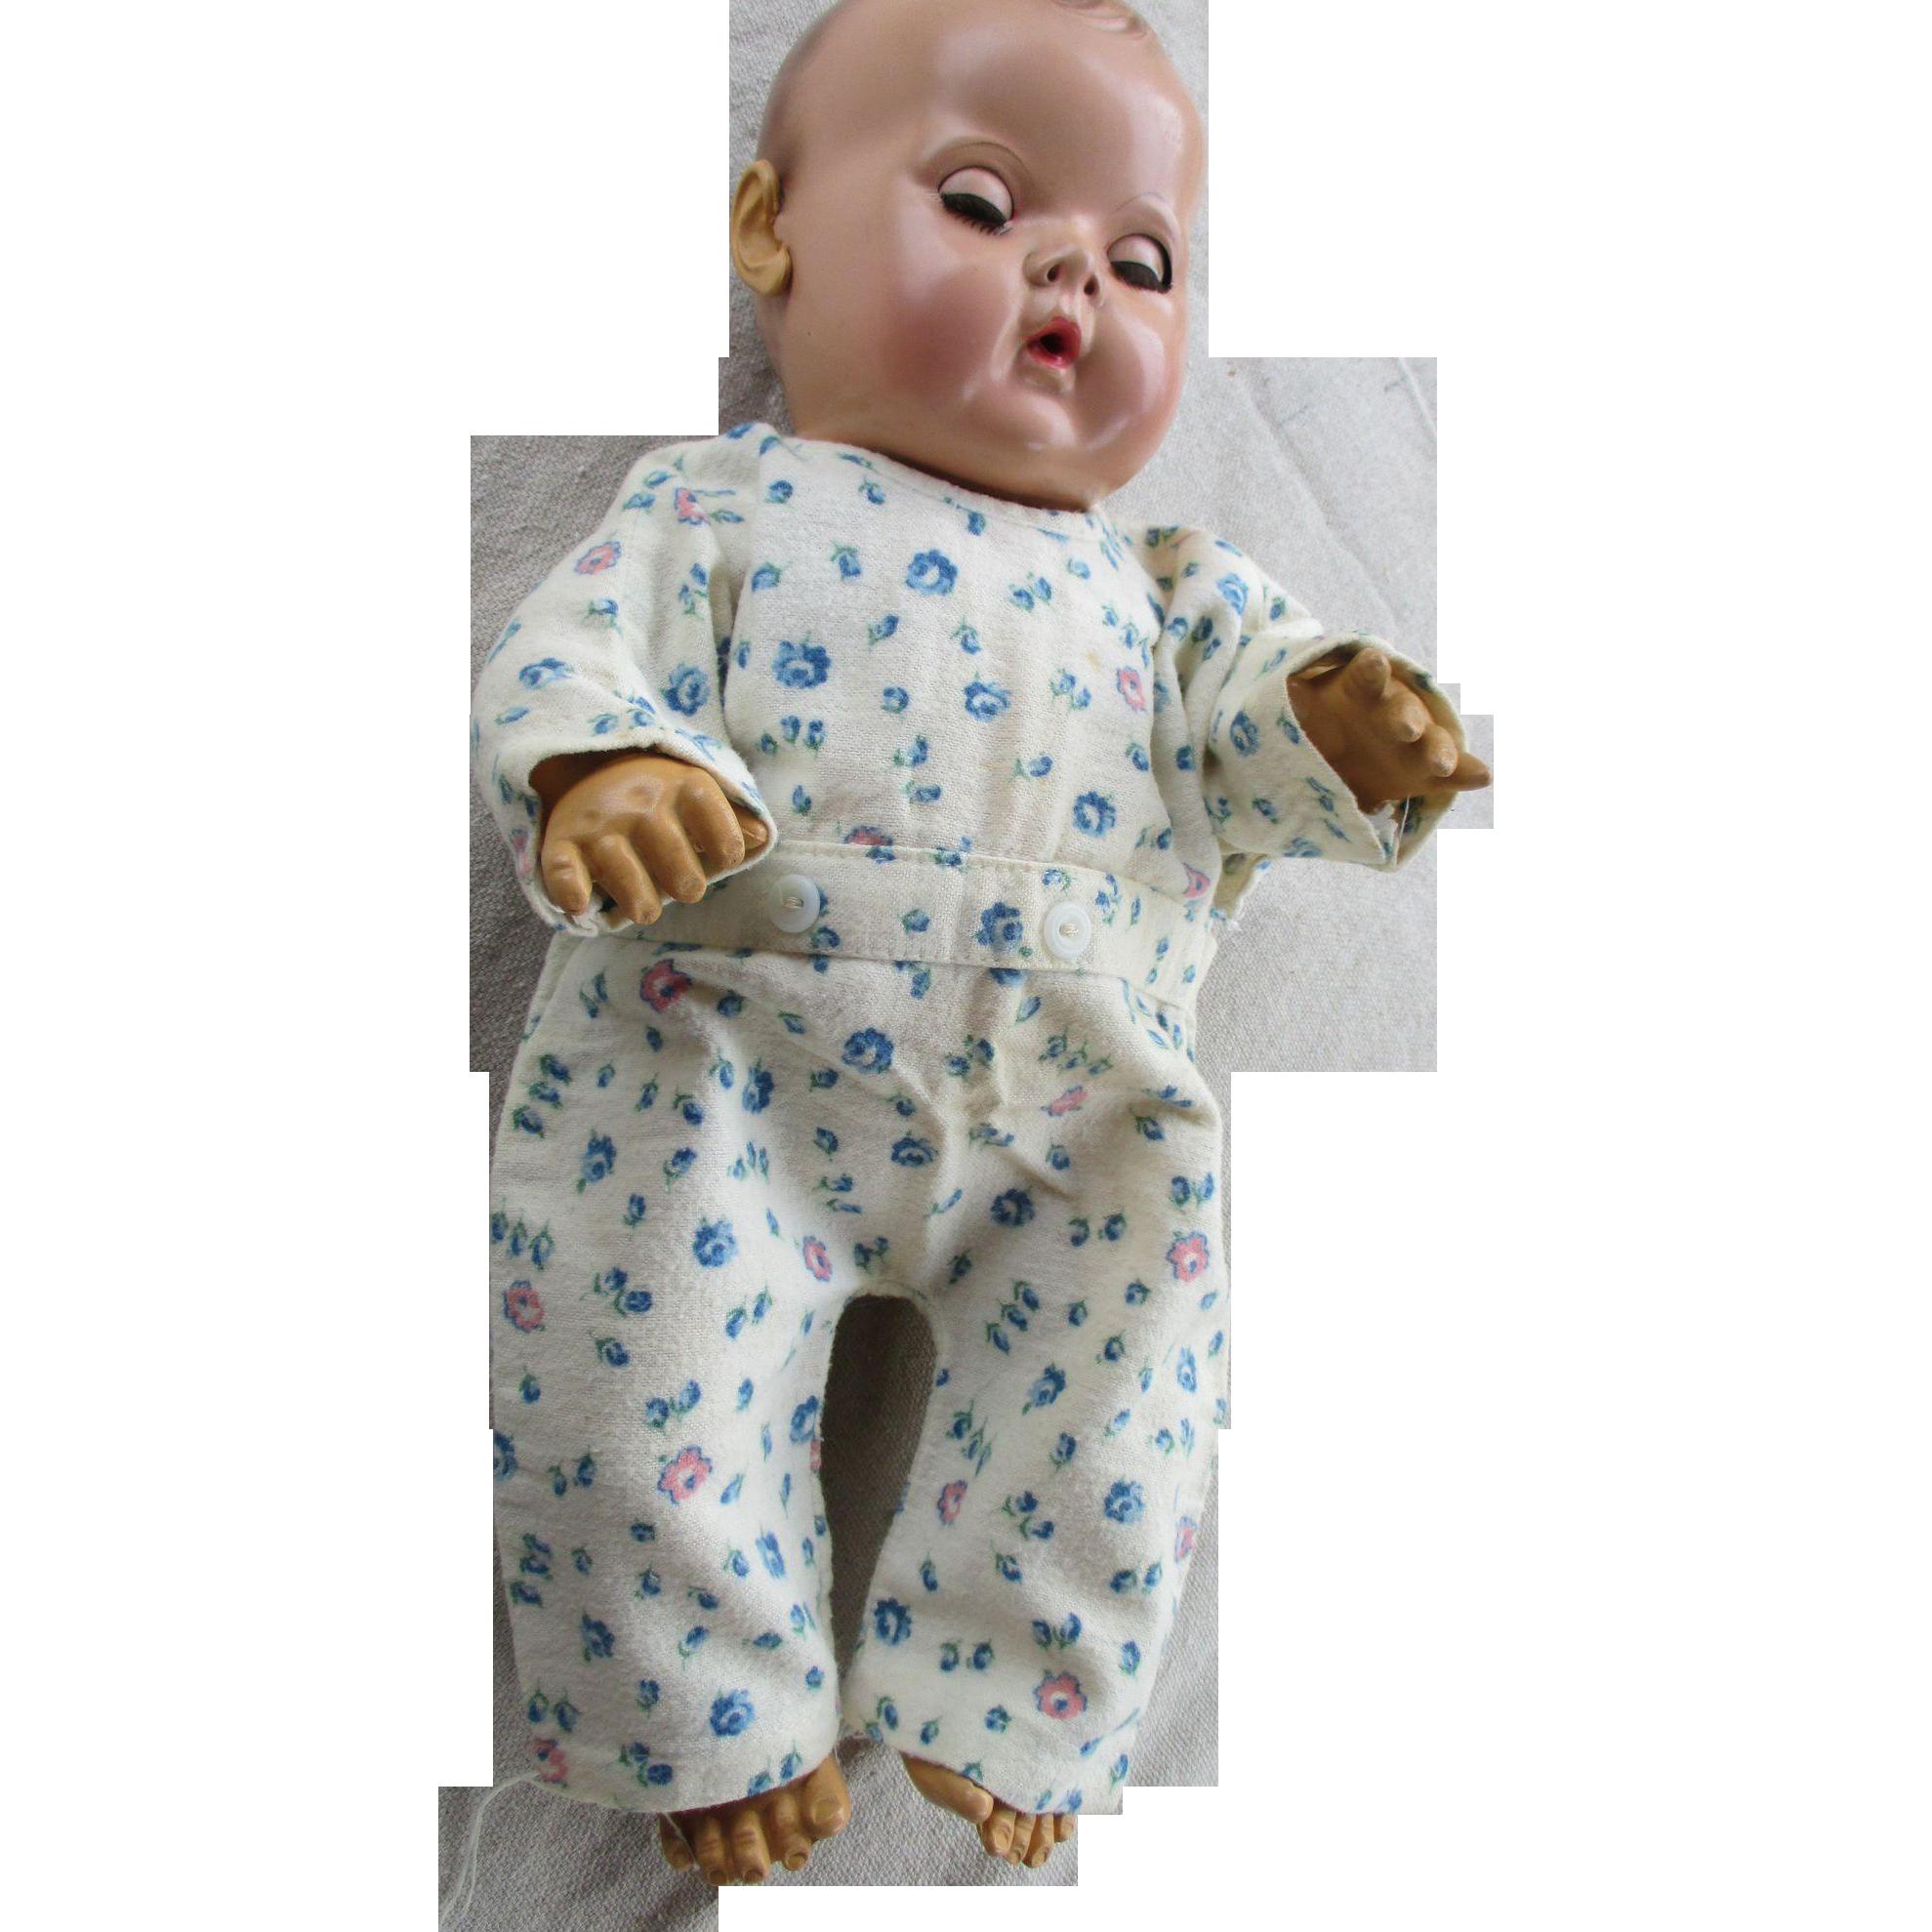 Baby clothes pajamas kids boy girl Flannel bathrobe sleepwear cartoon пижама.